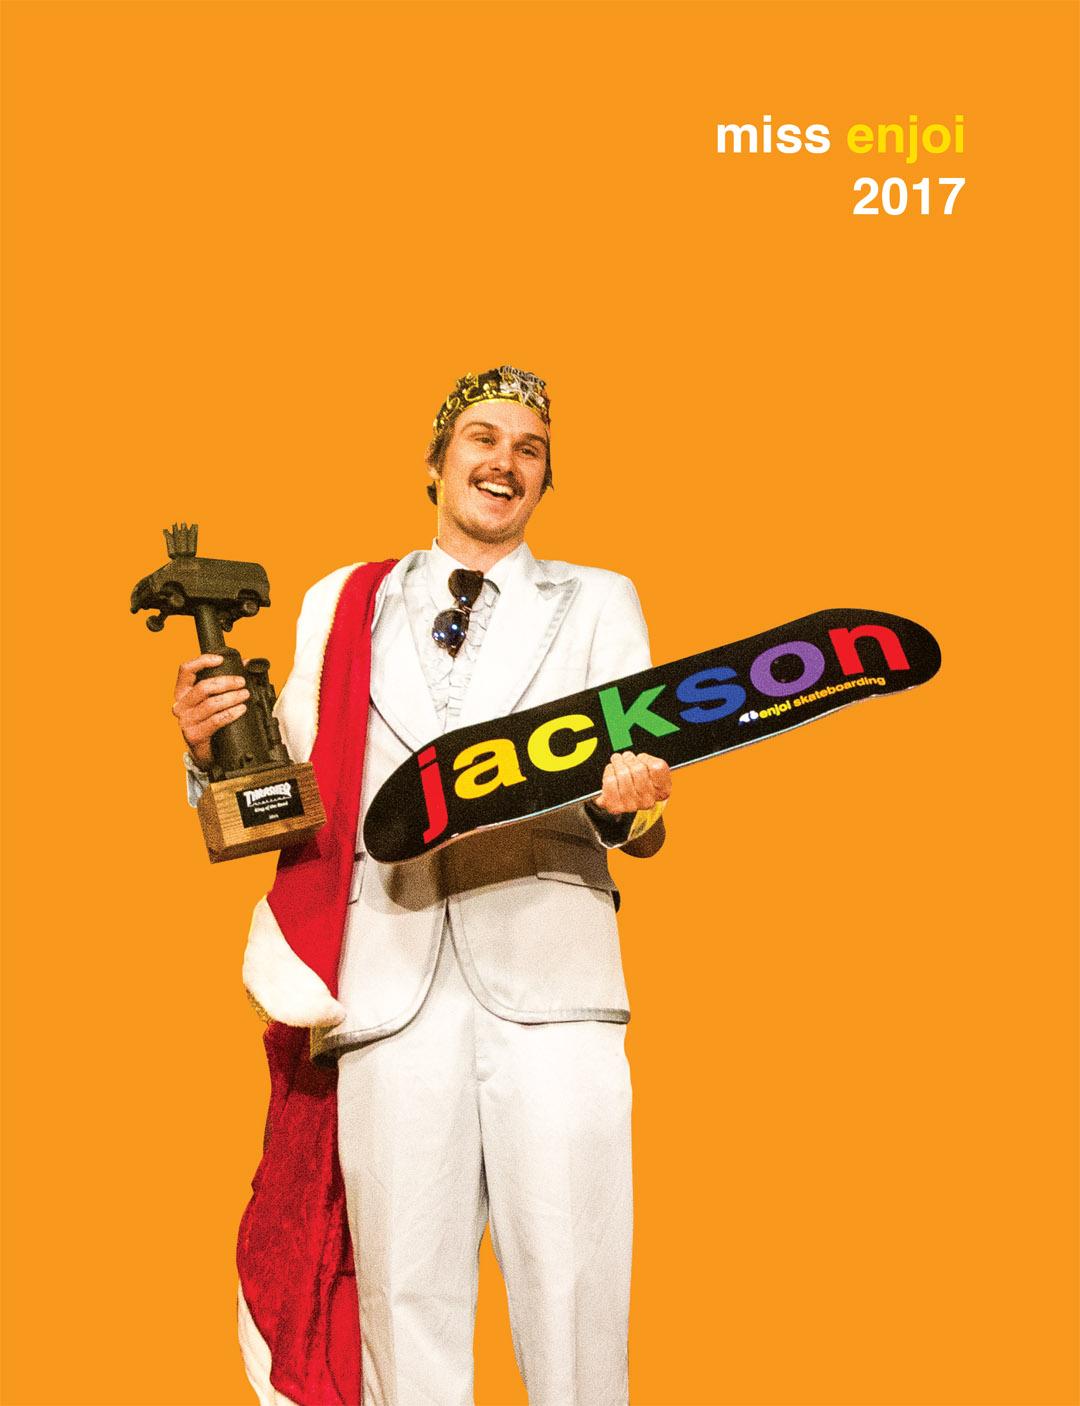 2017_THRASHER_JACKSON_MISSENJOI_FINAL.jpg